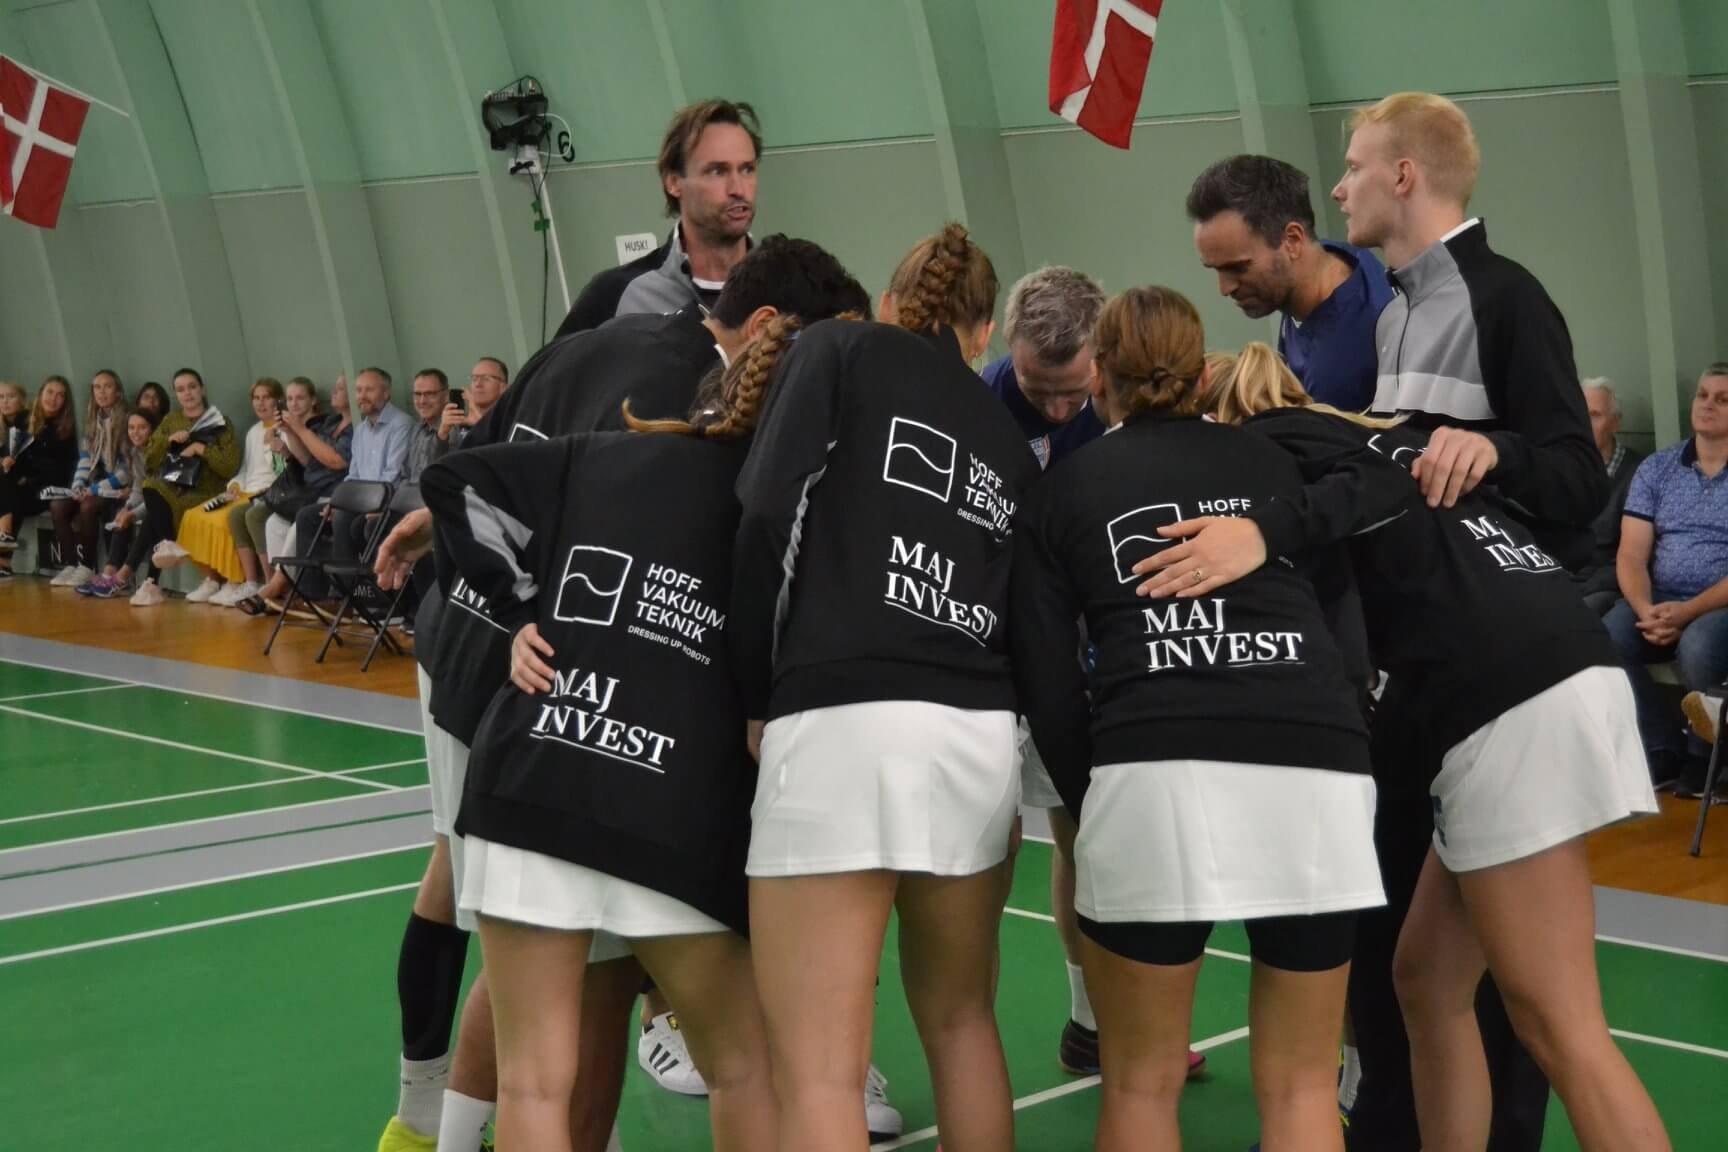 Tine Bay, Højbjerg Badmintonklub